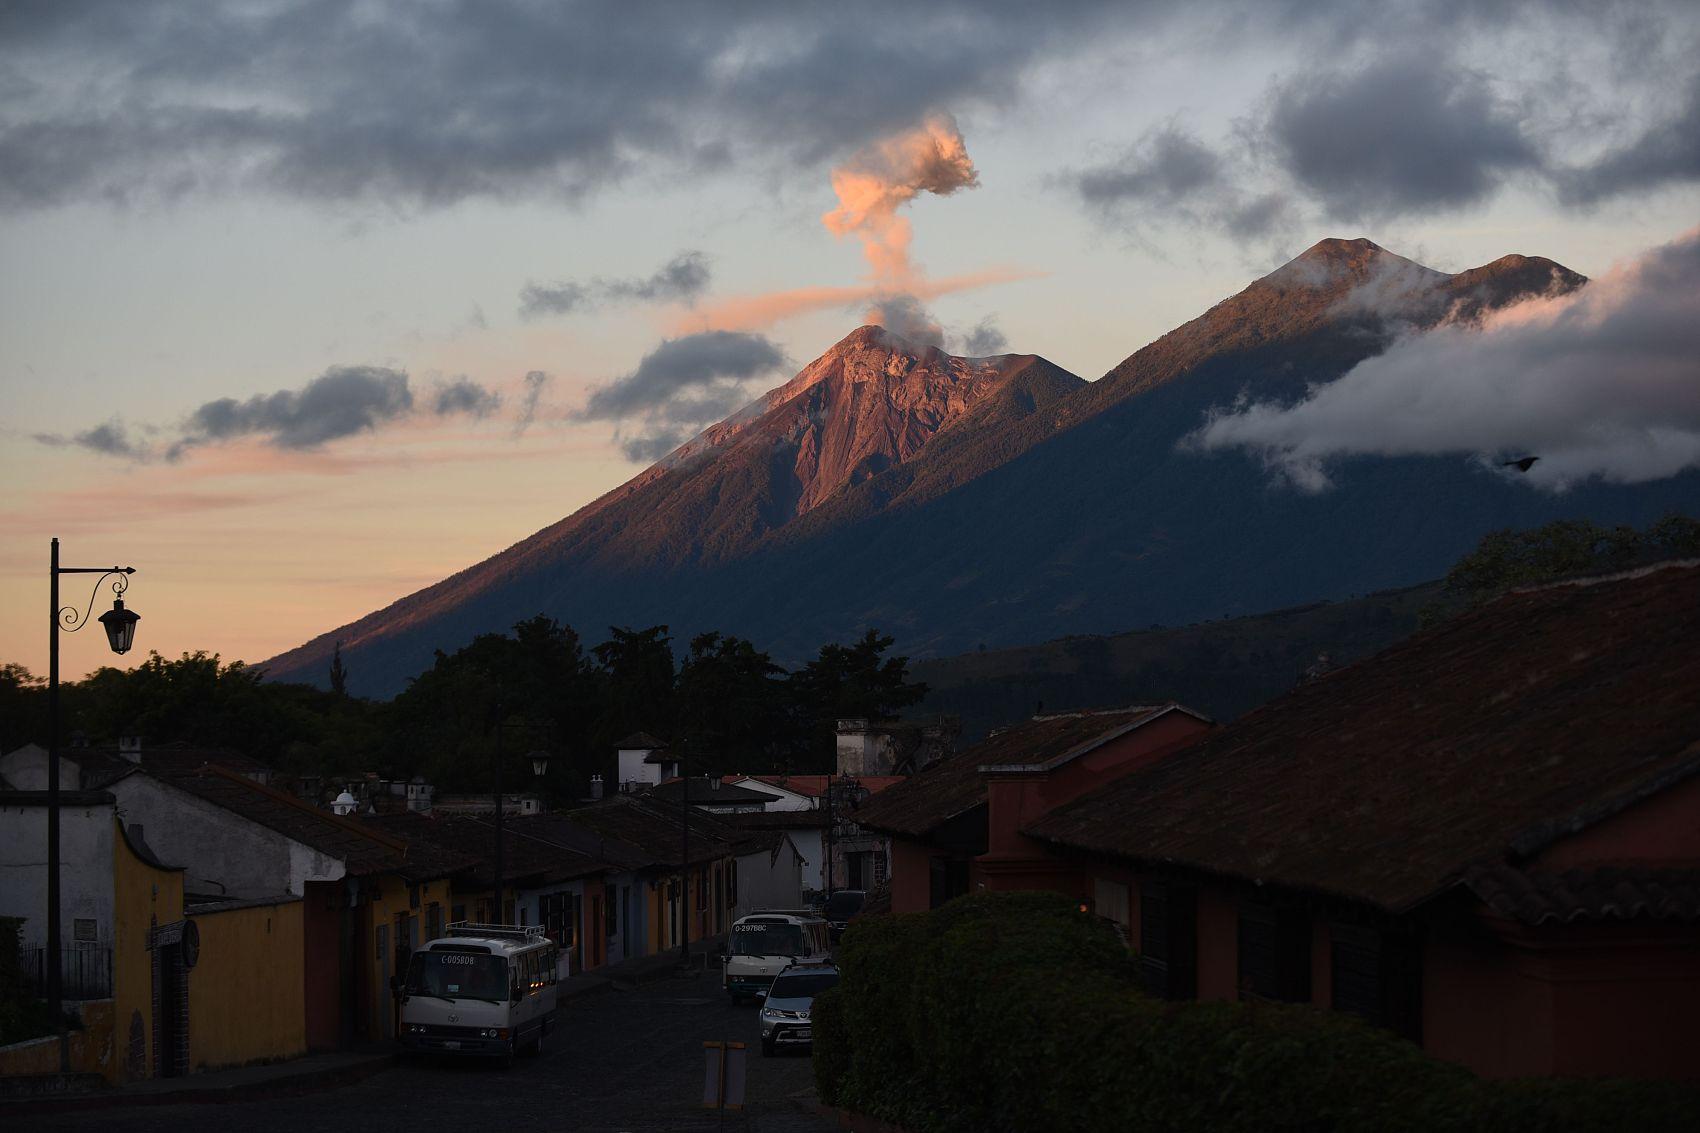 Authorities call for evacuations around Volcano of Fire in Guatemala